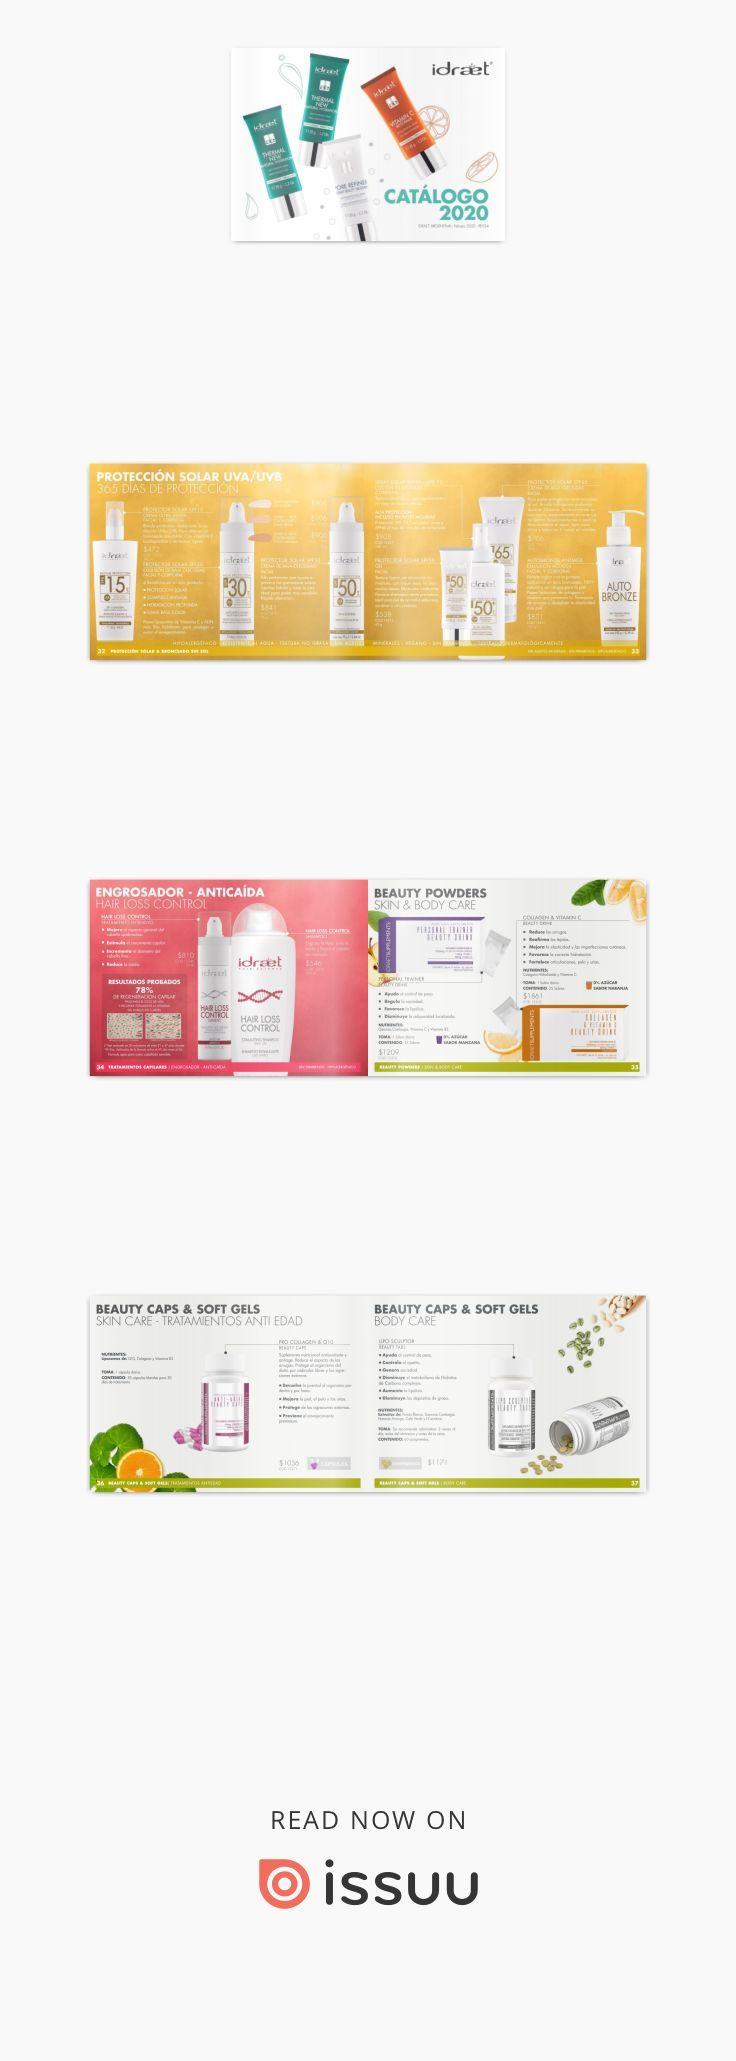 Catálogo 2020 Idraet Dermopurity